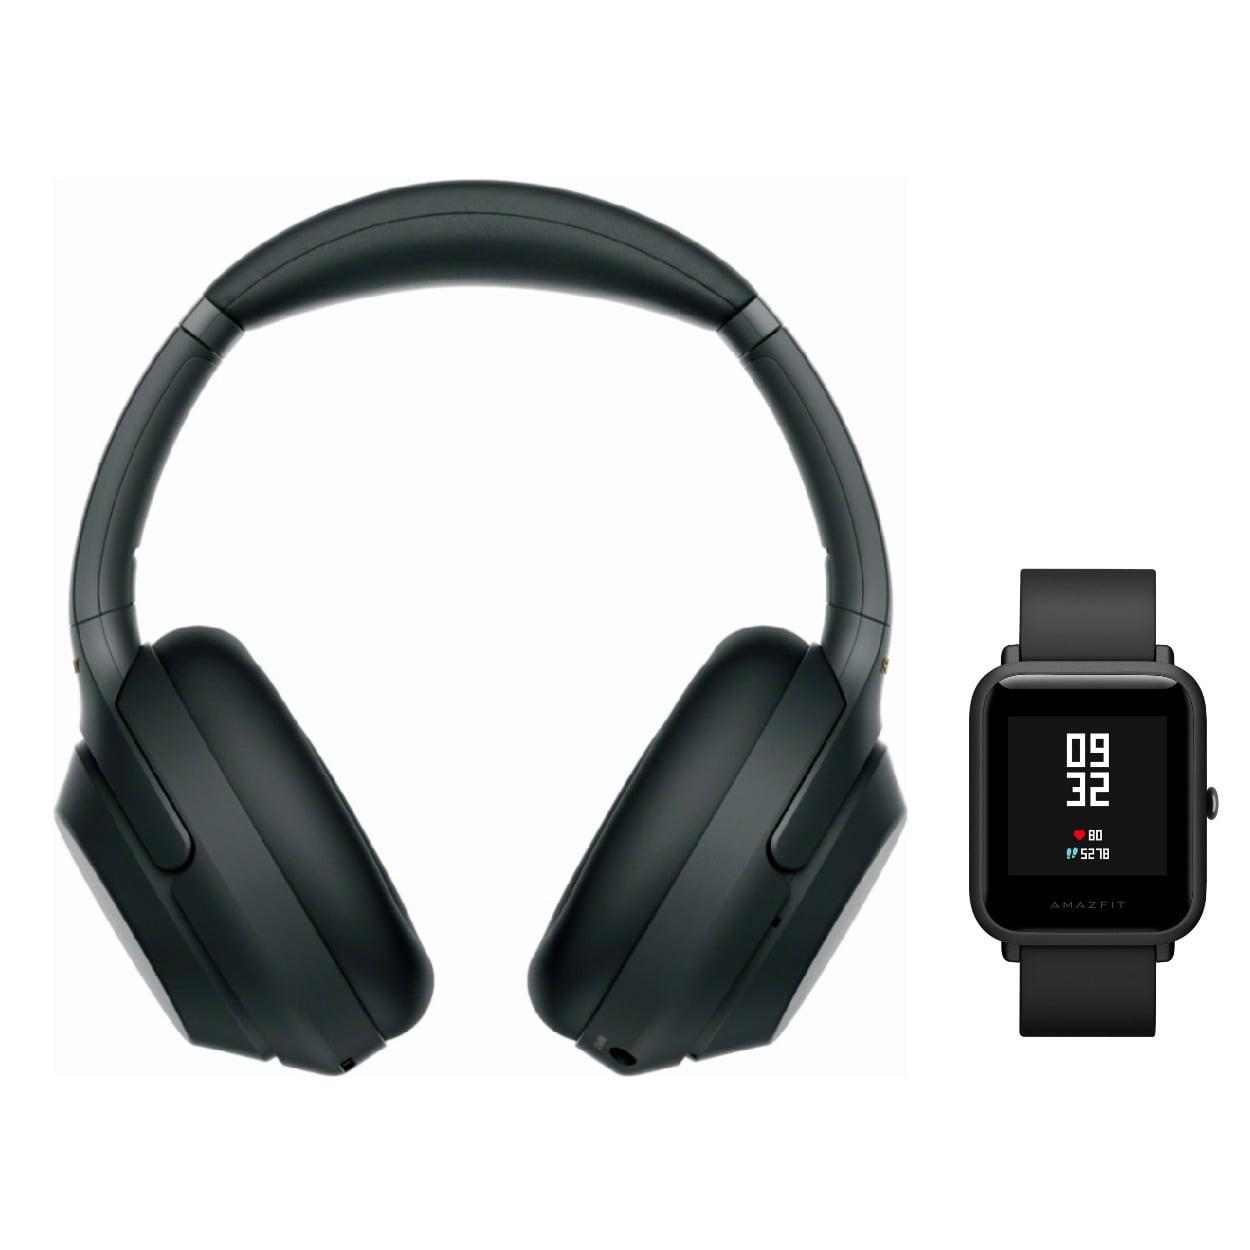 Sony WH-1000XM3 Wireless Headphones (Black) with Amazfit Bip (Onyx Black)